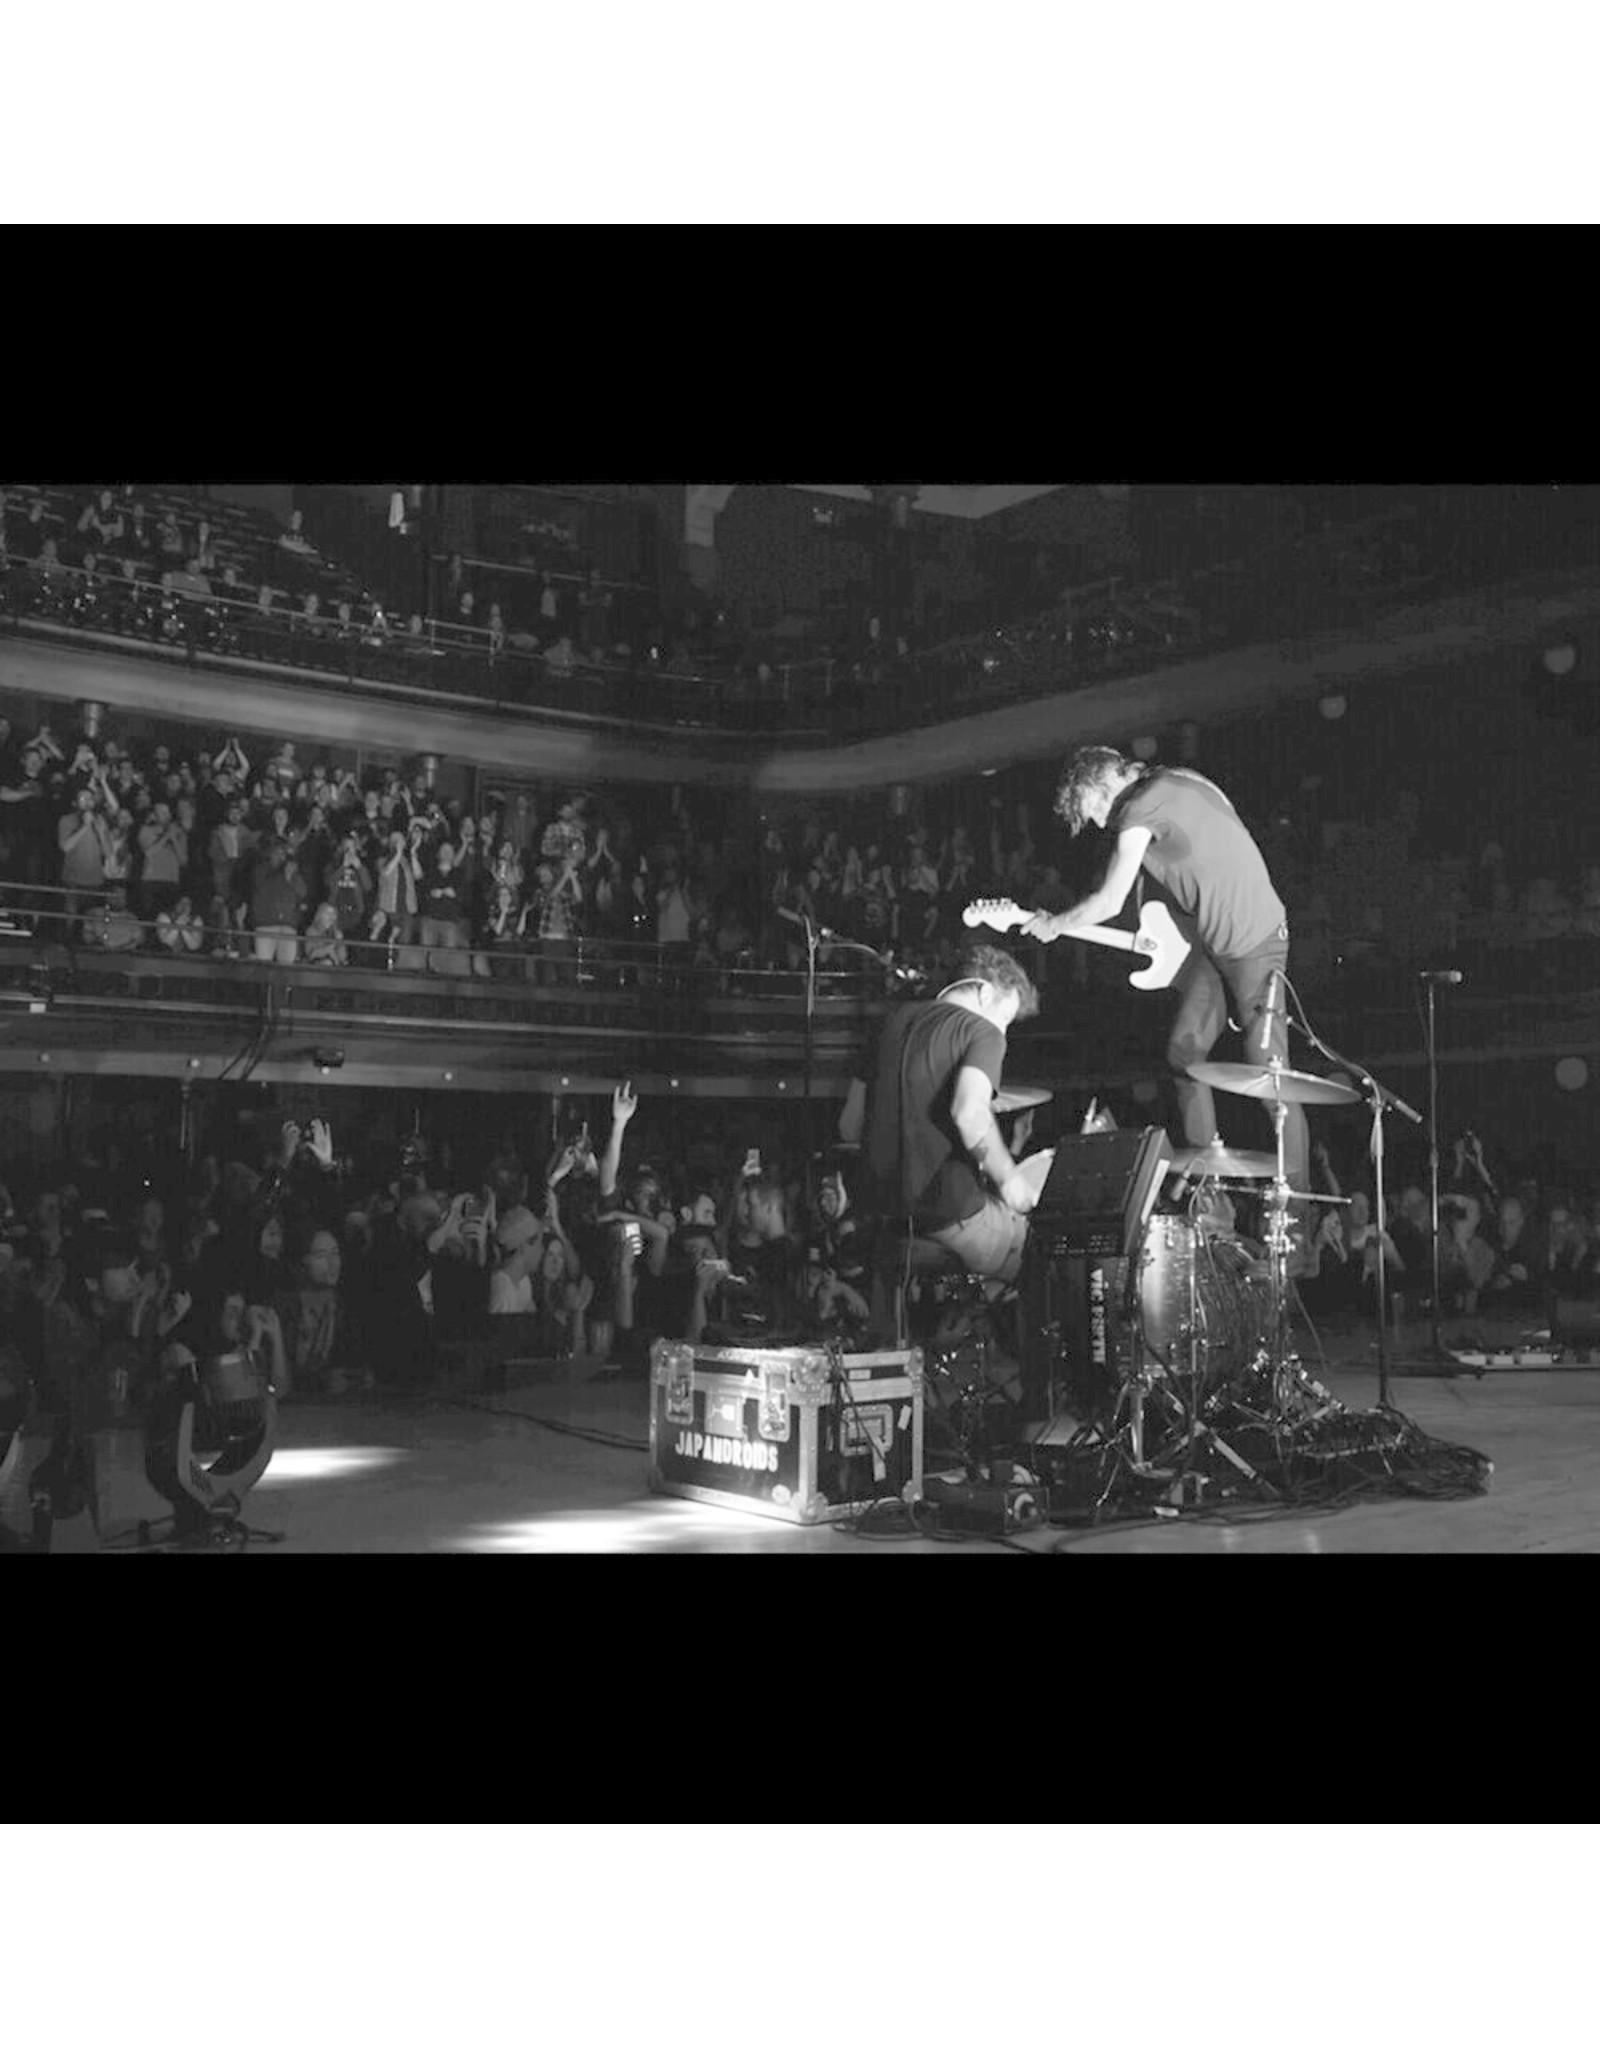 Japandroids - Massey Fucking Hall LP